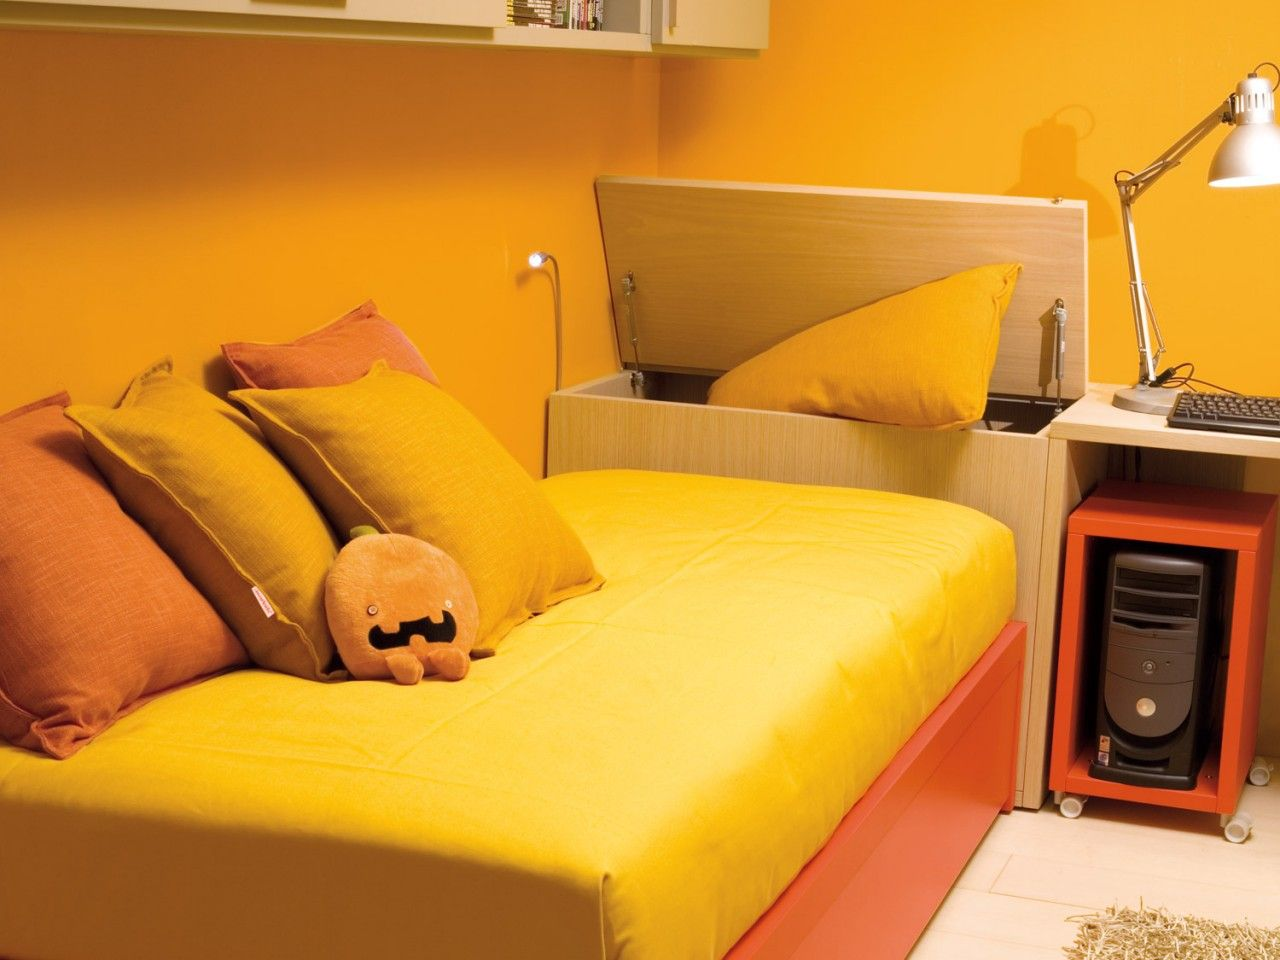 Callesella Camerette ~ Bedroom with stuffed bed cameretta con letto imbottito